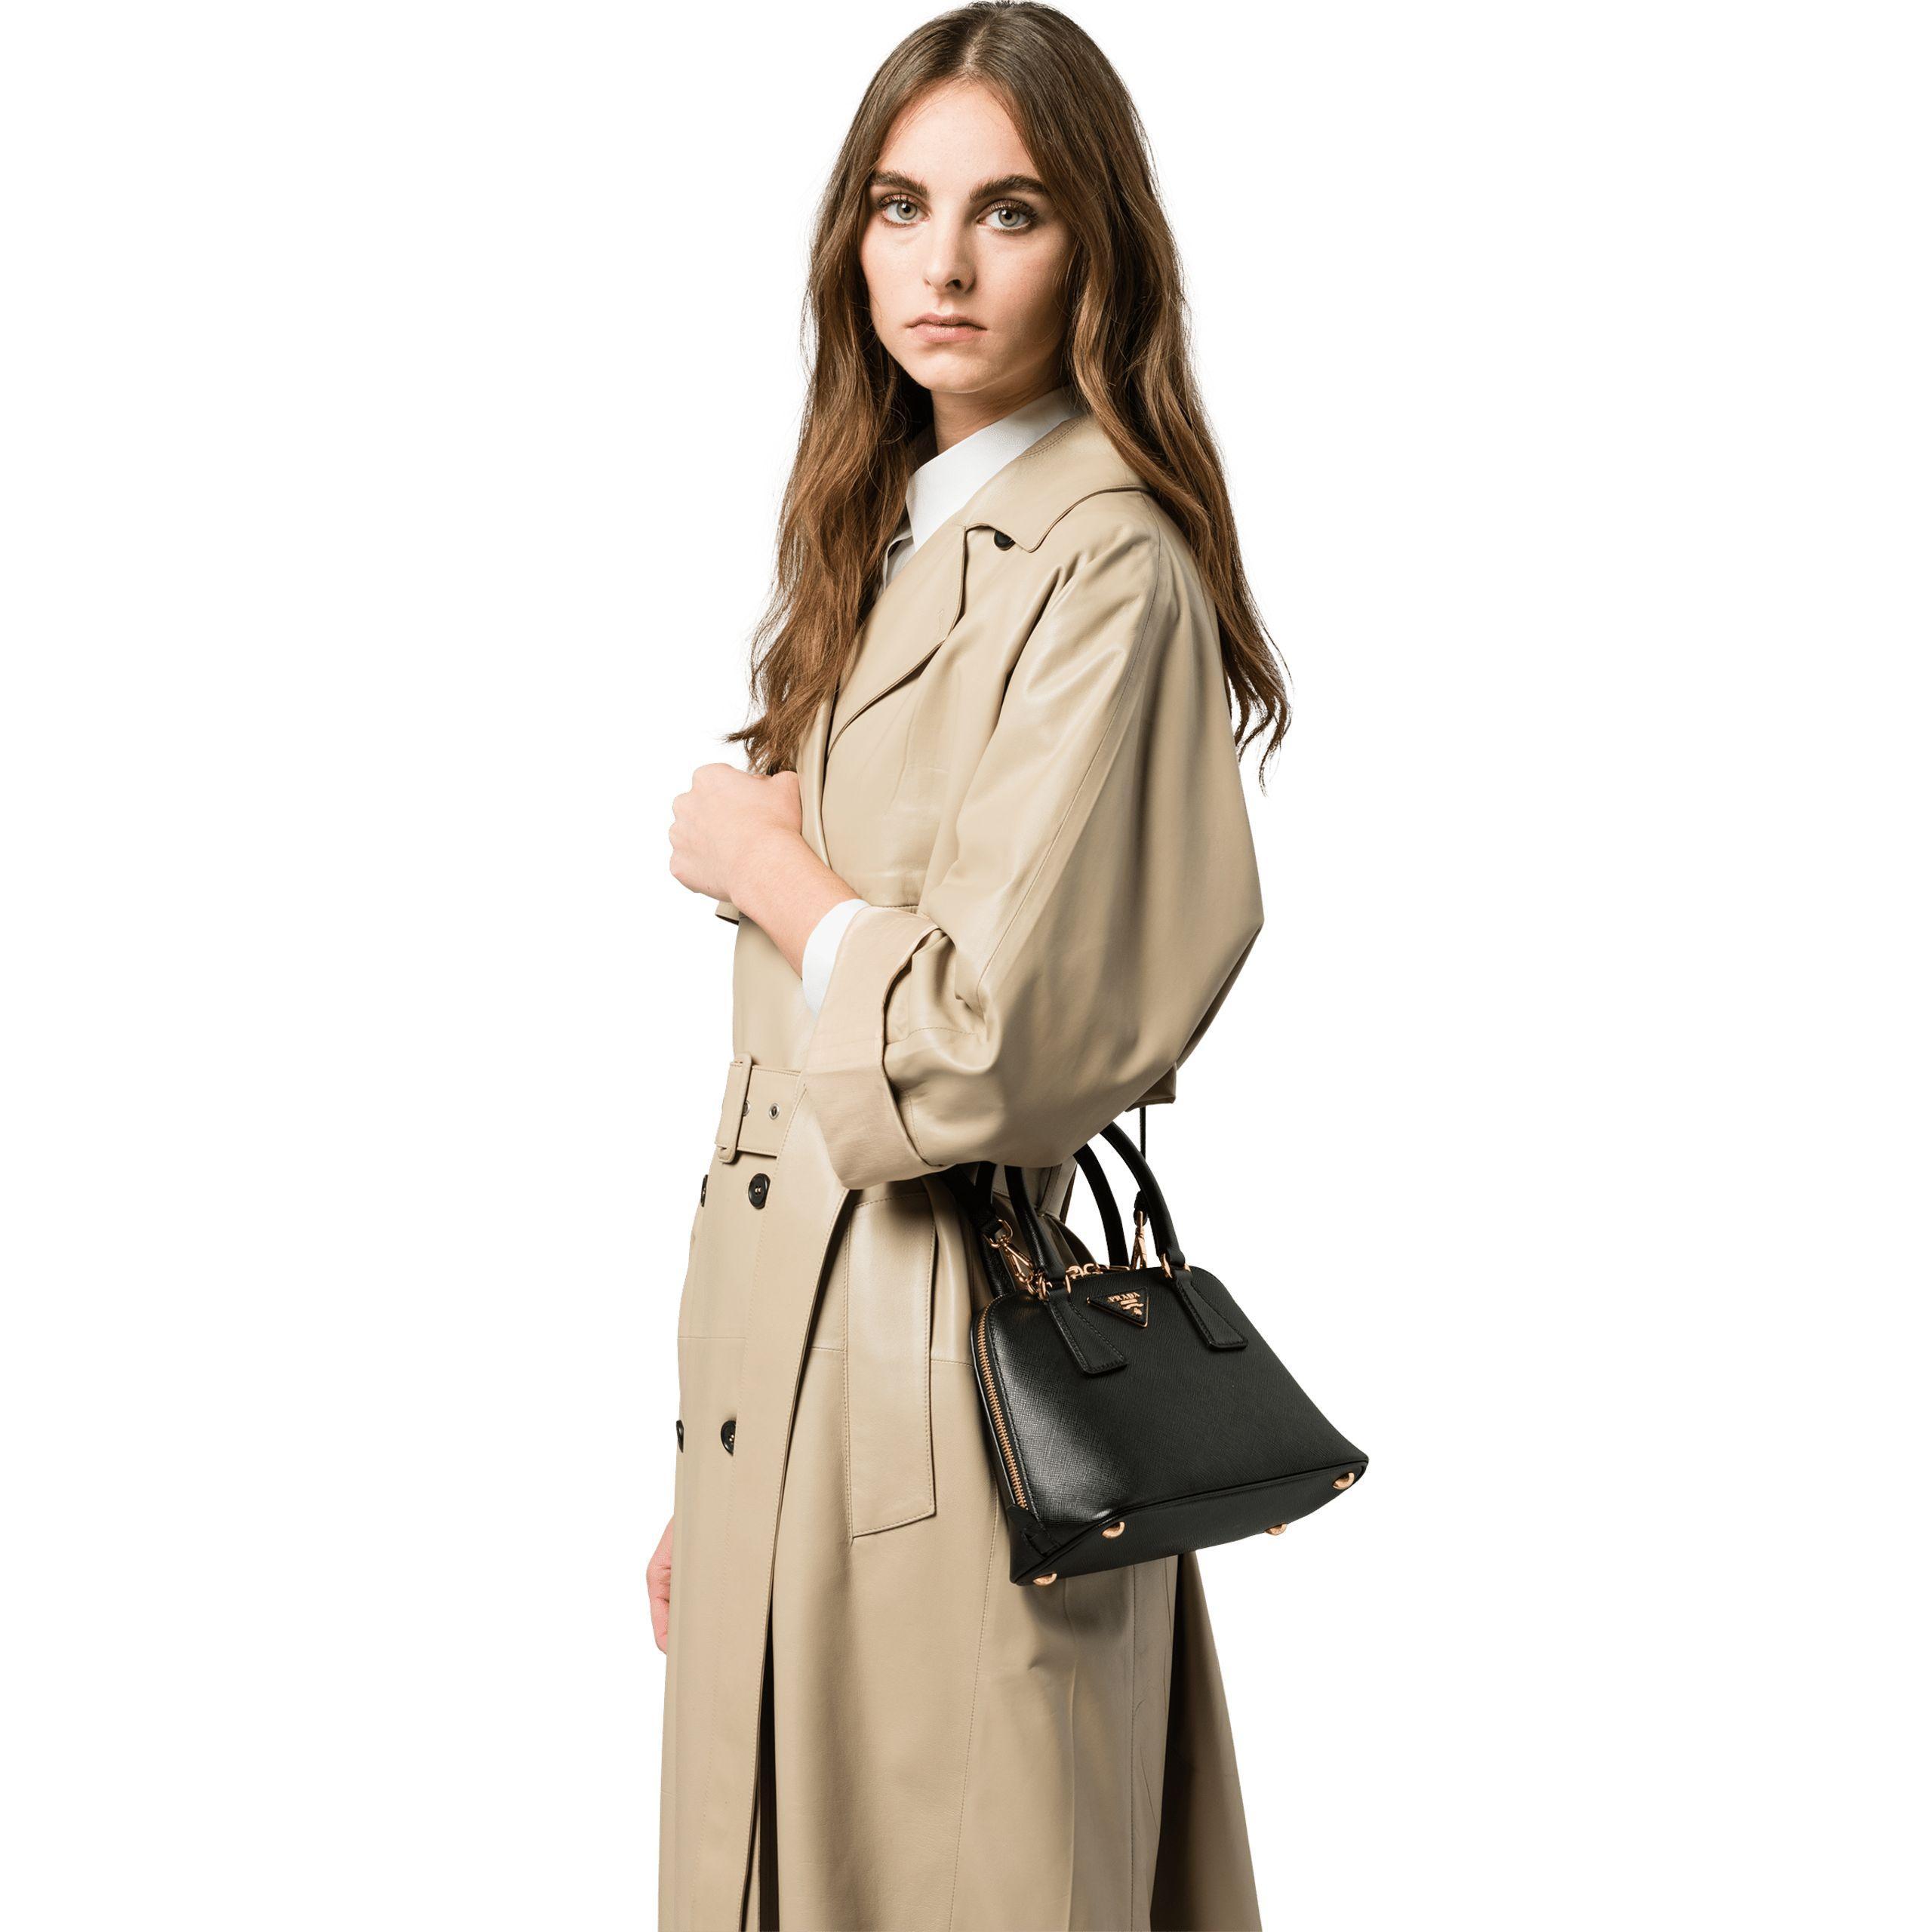 c3769e7b464d Lyst - Prada Promenade Saffiano Leather Bag in Black